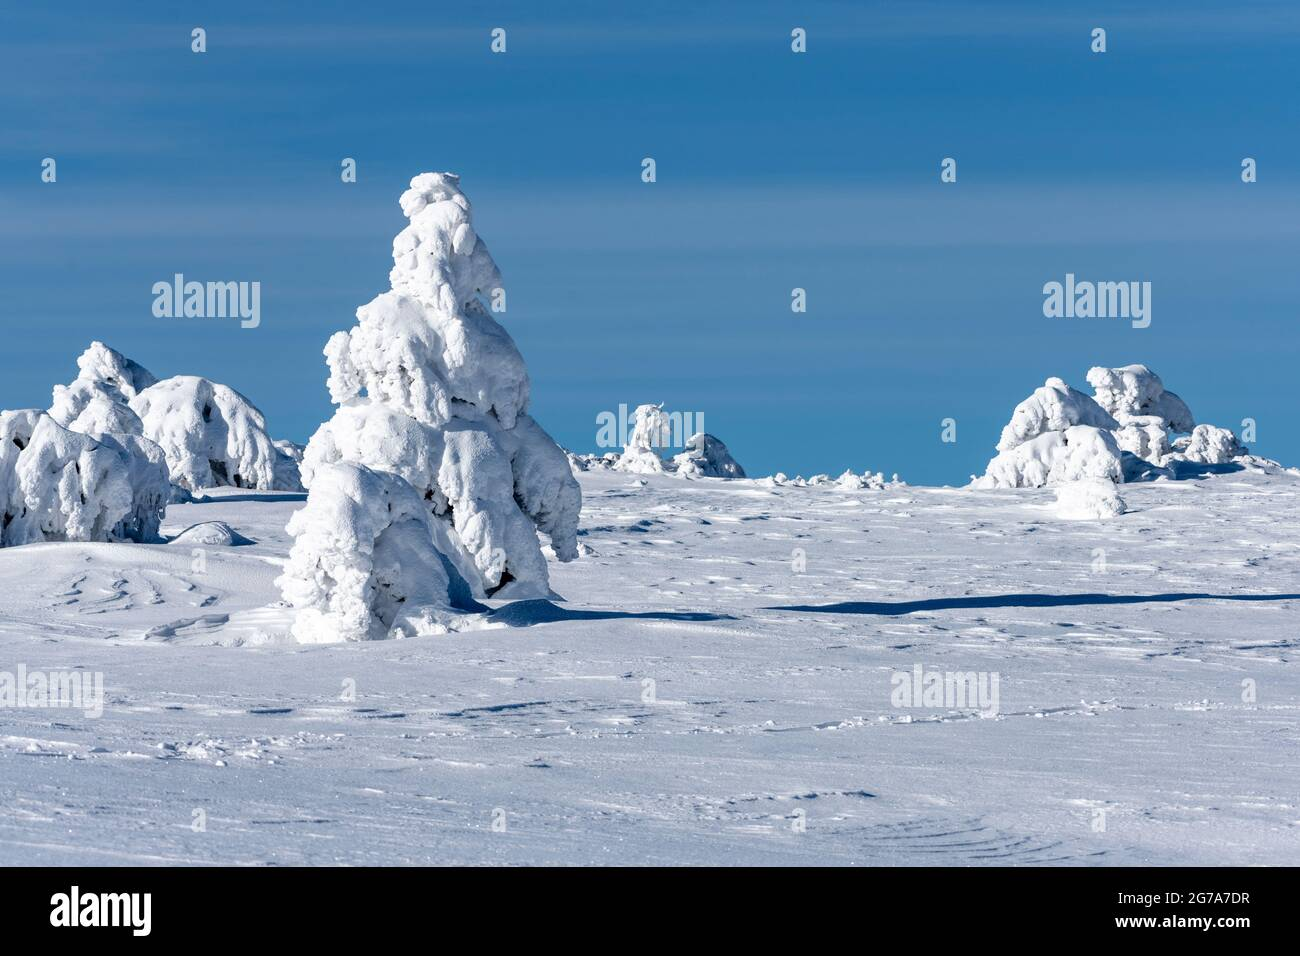 Alemania, Baden-Württemberg, Selva Negra, Hornisgrinde, árboles nevados. Foto de stock